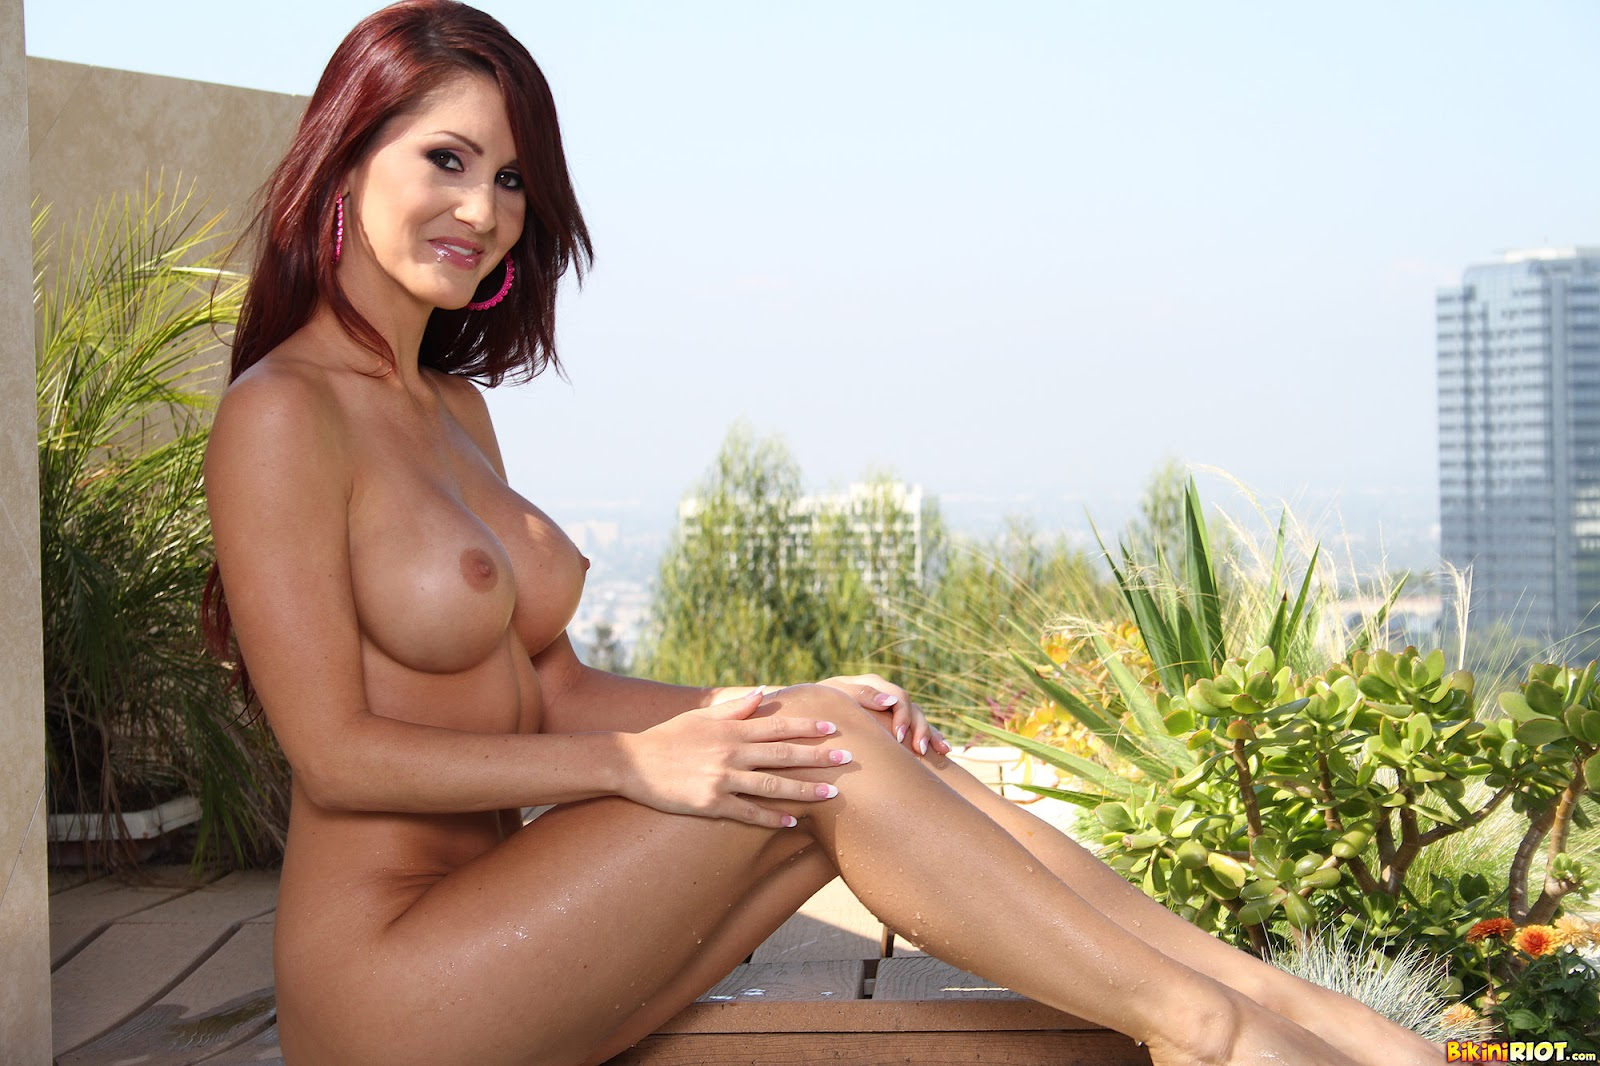 Стройная красавица голая фото 5 фотография